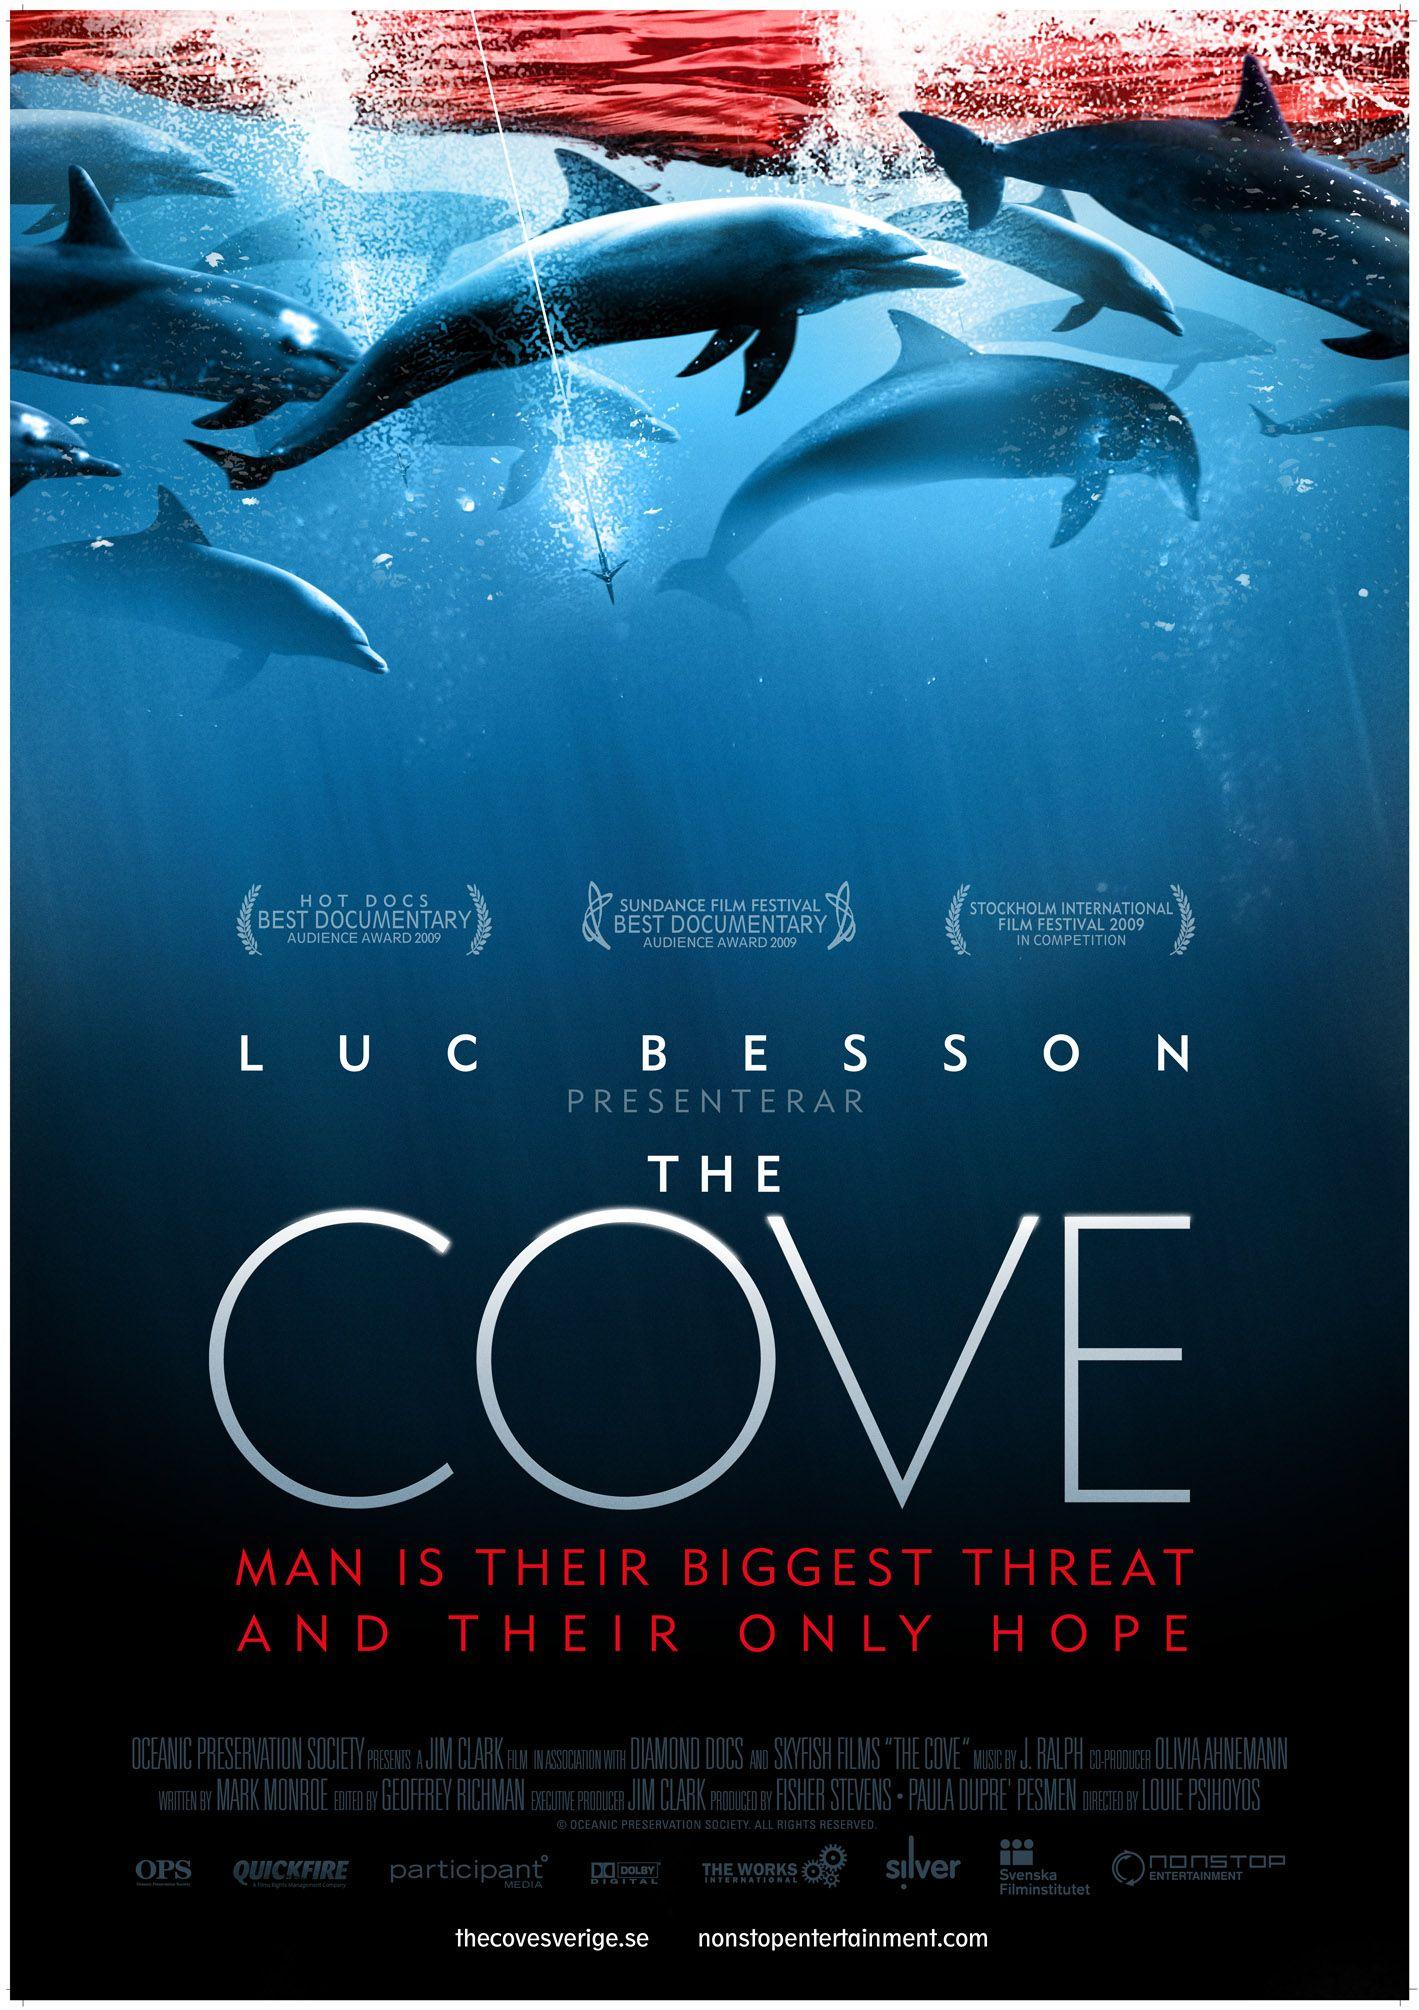 Louie Psihoyos »The Cove« 2009